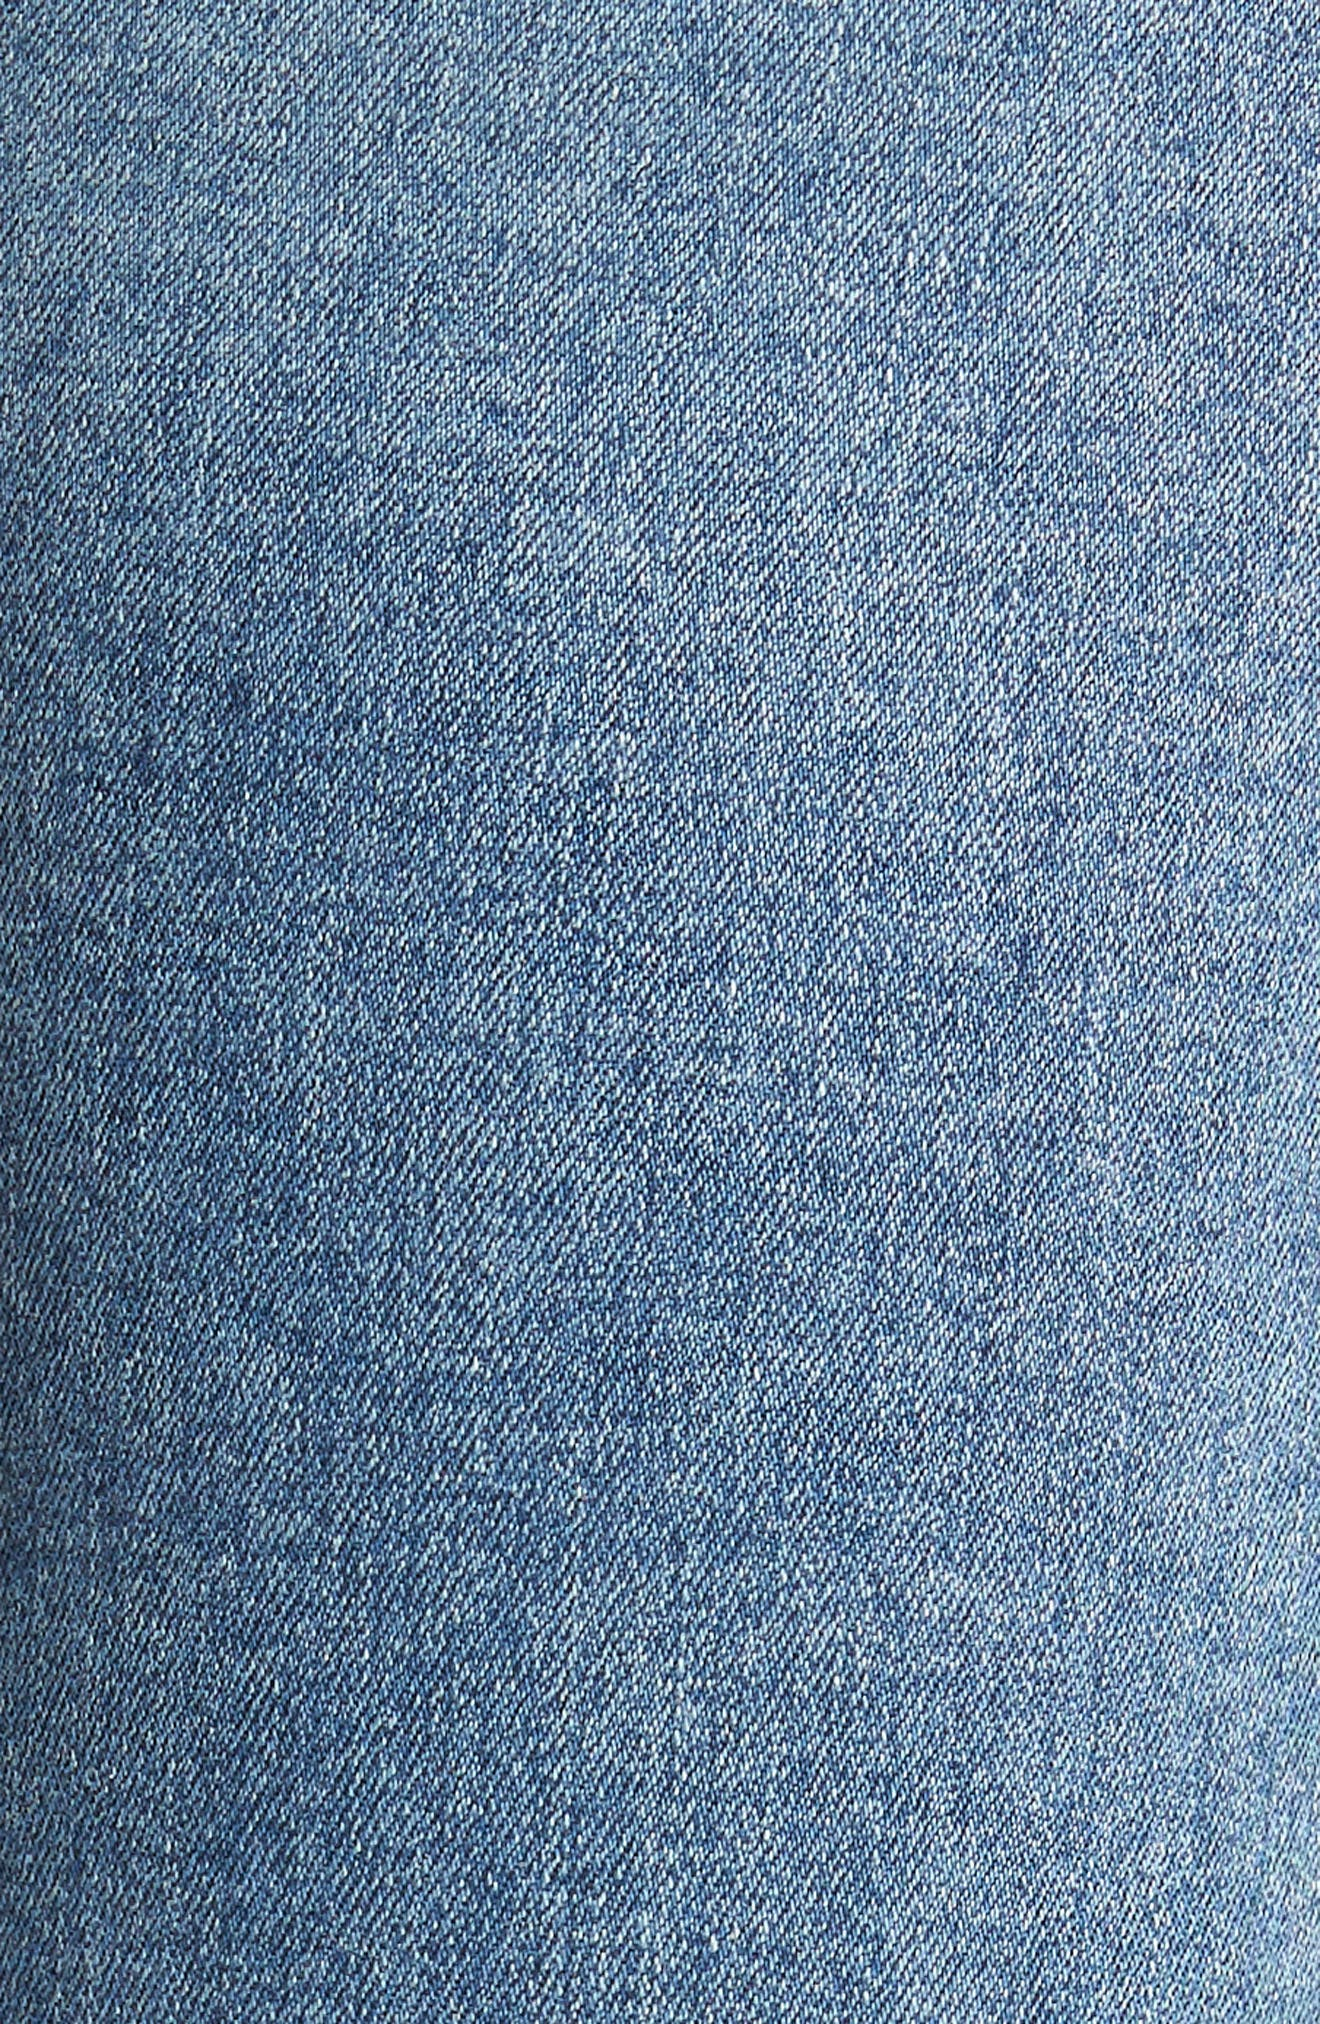 Cara Ankle Cigarette Jeans,                             Alternate thumbnail 6, color,                             Firestone